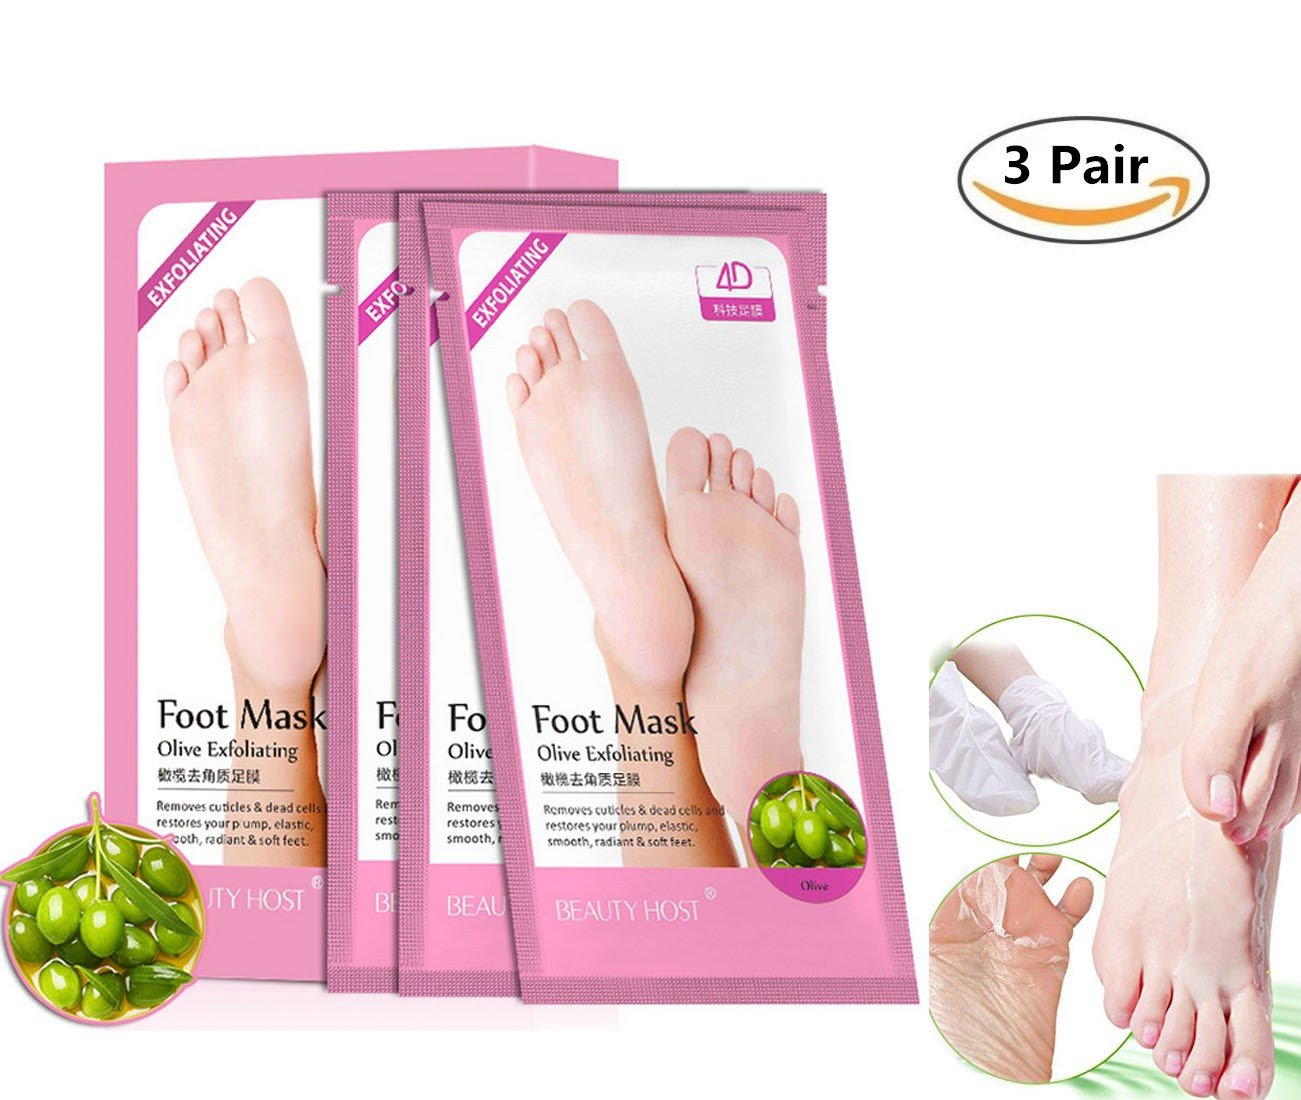 Foot Peeling Mask, ONEGenug 3 Pair Exfoliating Feet Mask, Olive Oil Essence Peeling Mask, Remove Calluses / Cracks / Rough, Get soft Baby Feet in 1 Week